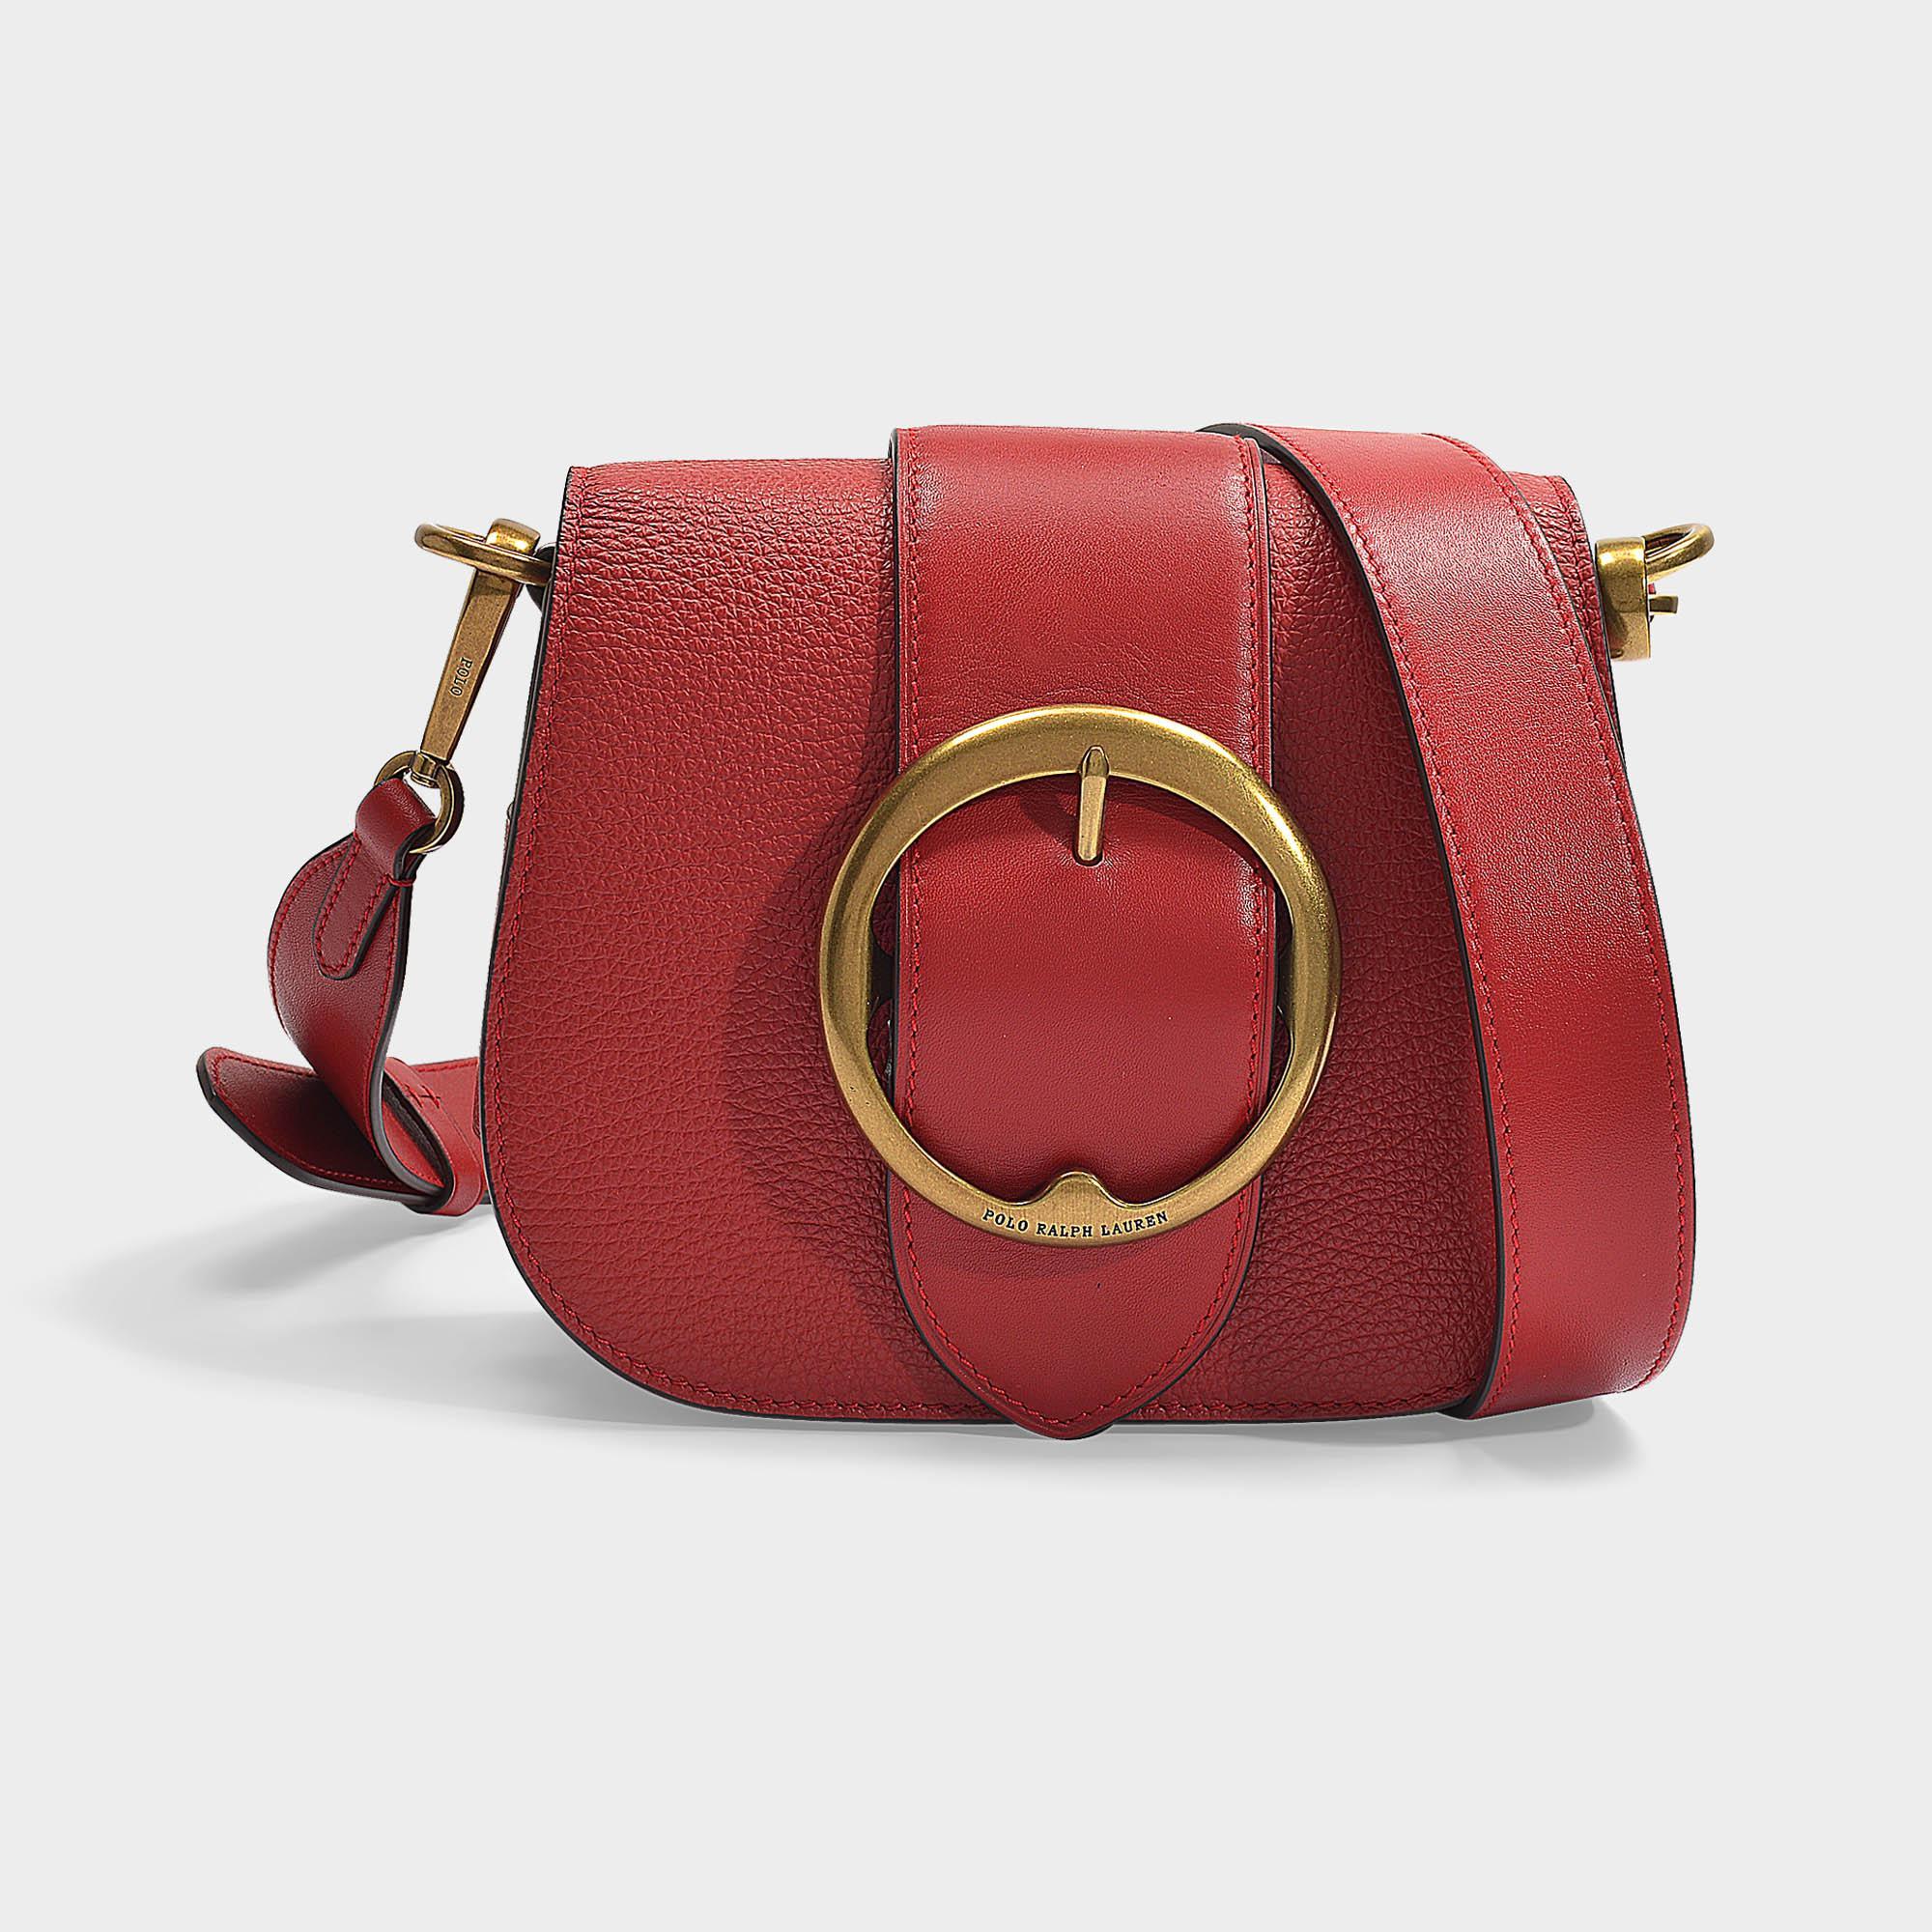 40d517ad8b Lyst - Polo Ralph Lauren Lennox Medium Crossbody Bag In Scarlet ...